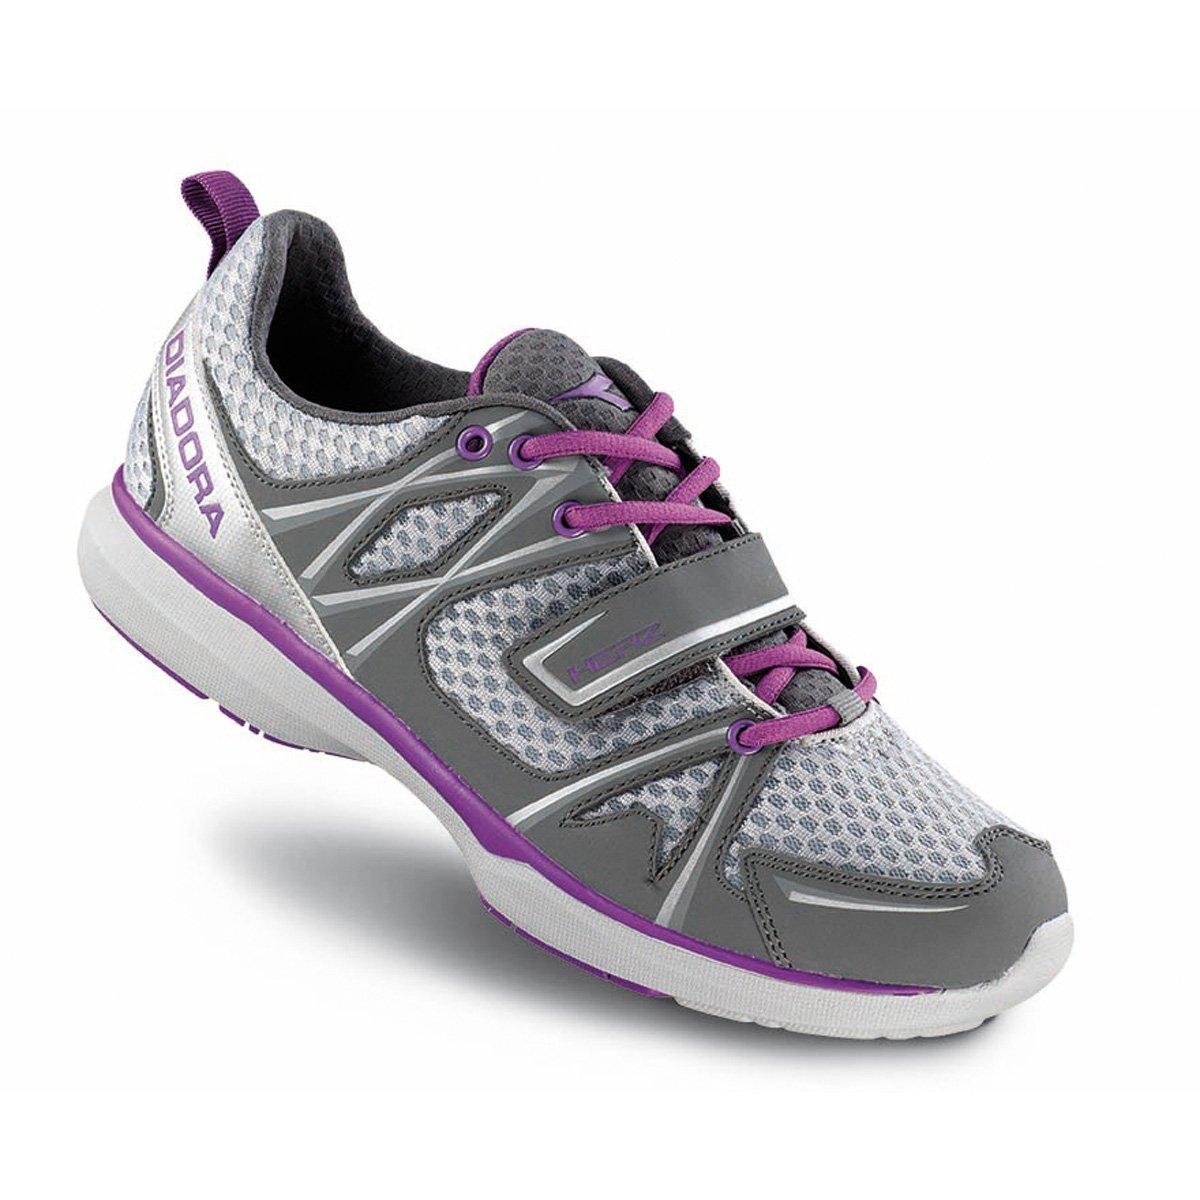 diadora women s herz indoor cycling shoe review optimum fitness. Black Bedroom Furniture Sets. Home Design Ideas